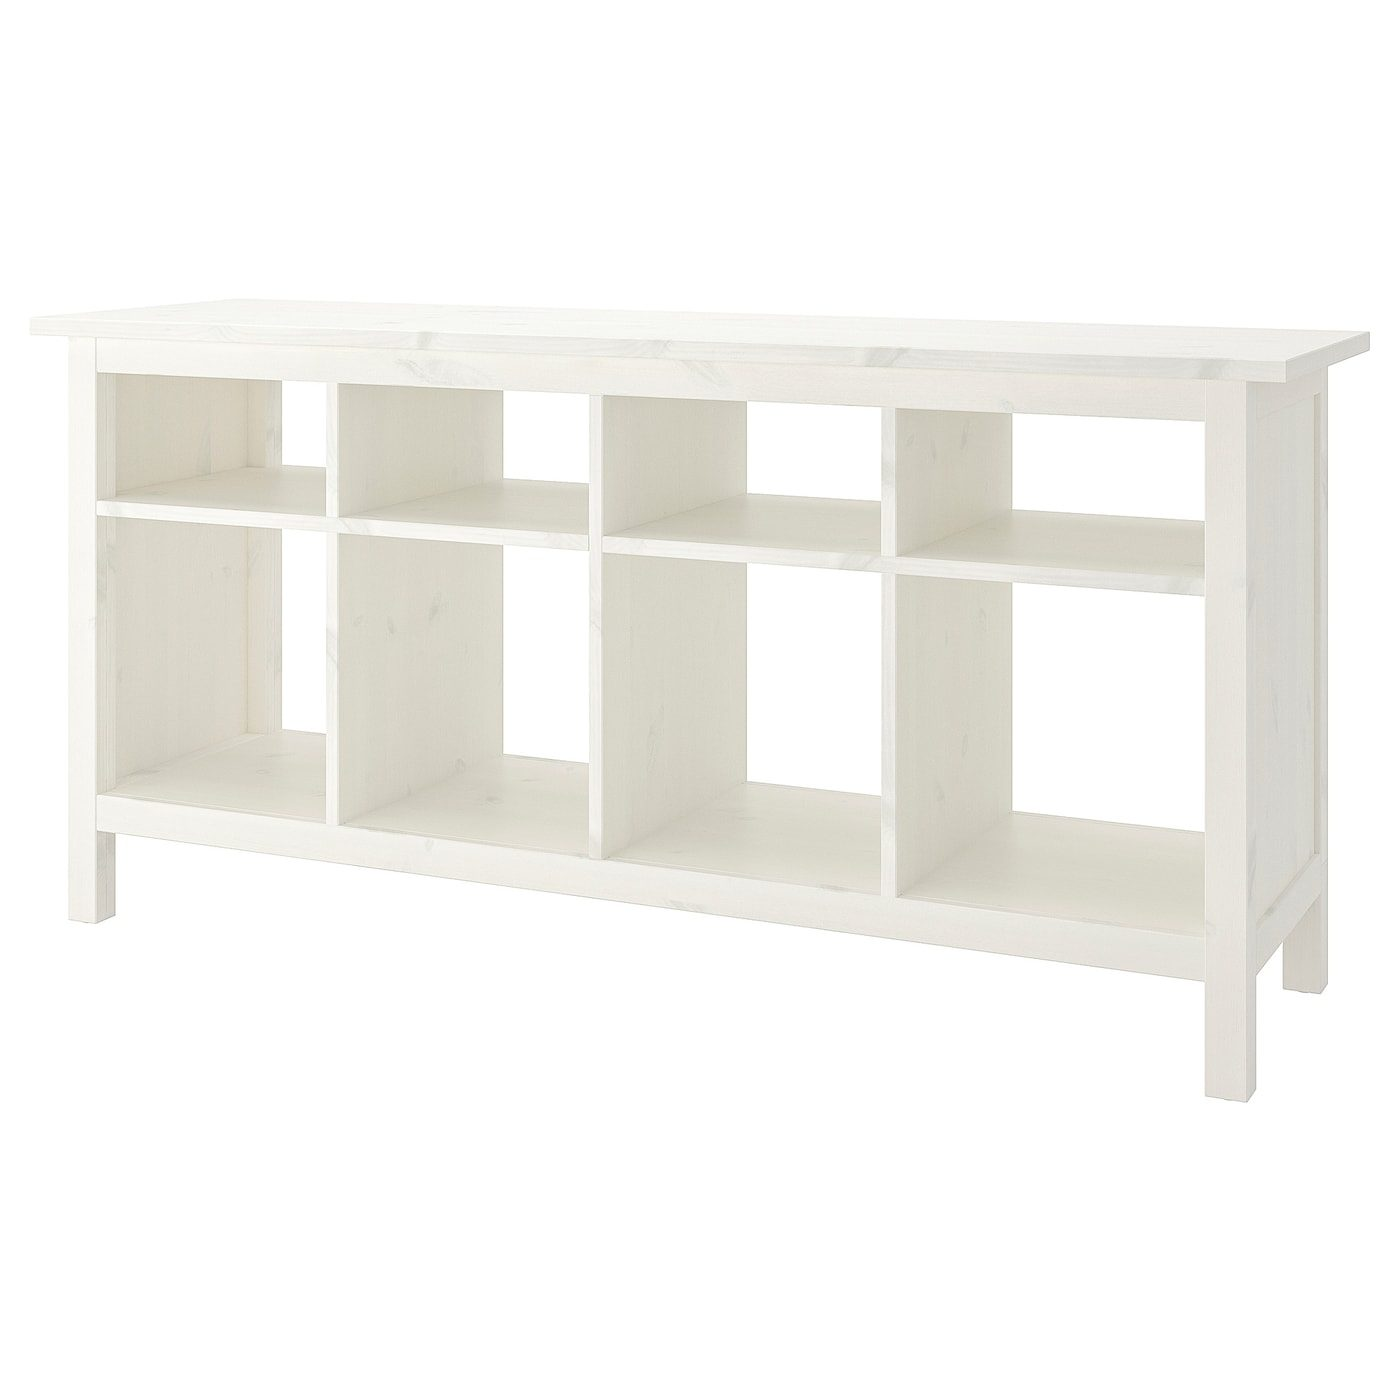 HEMNES Sofa Table White Stain - IKEAPEDIA